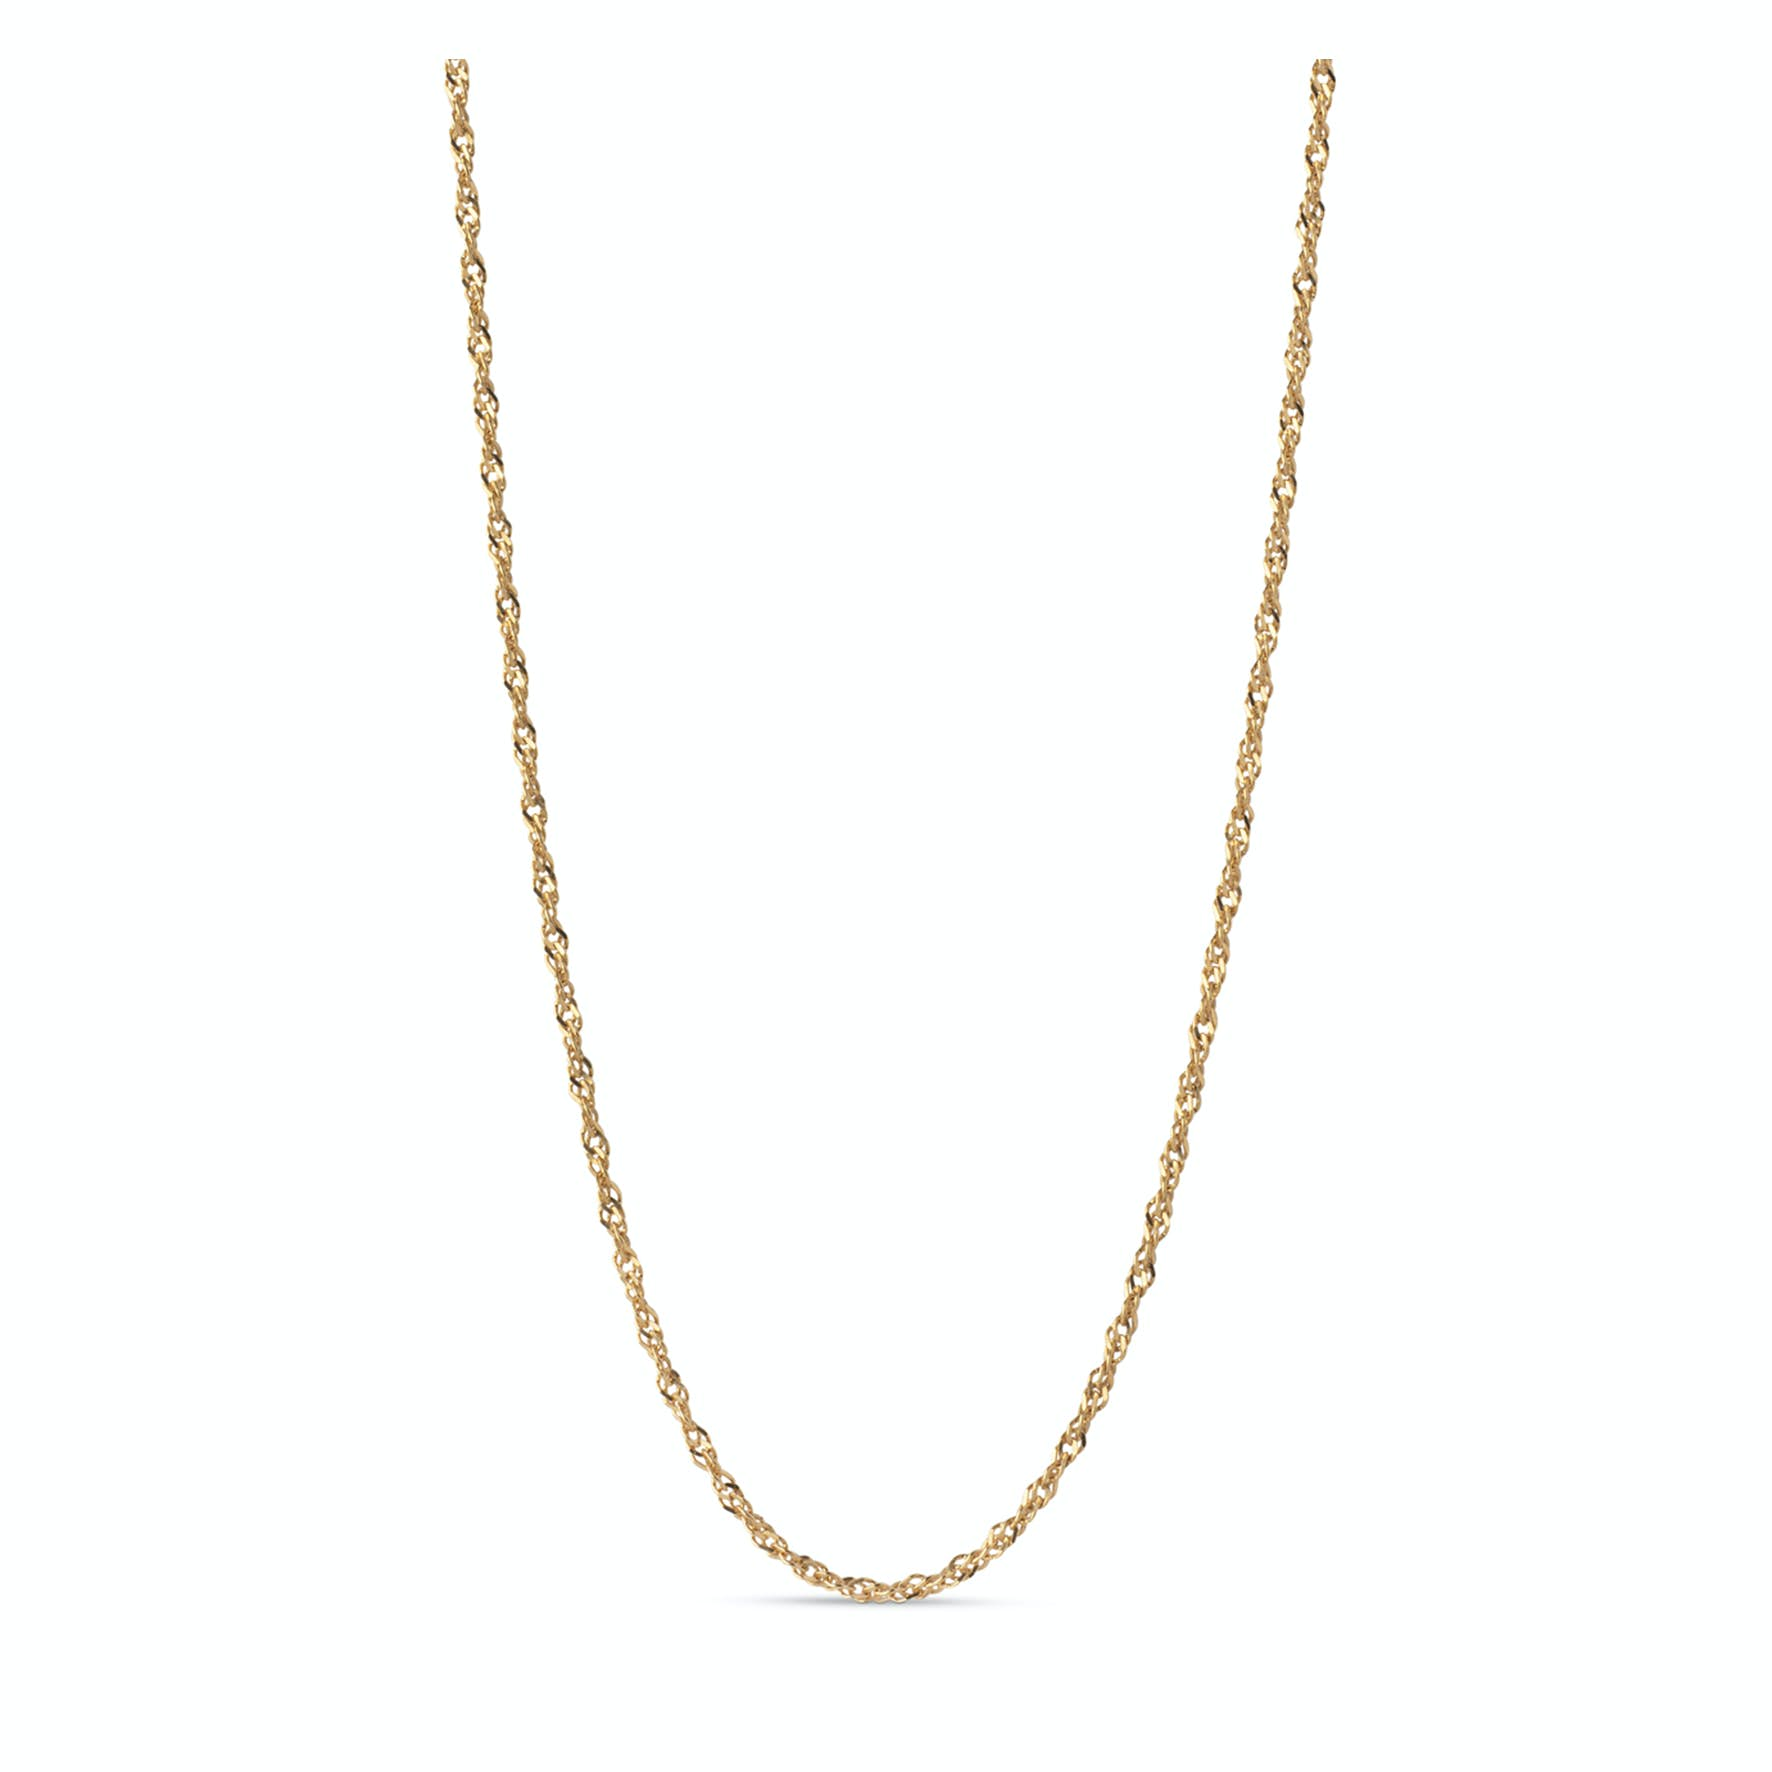 Paloma Necklace von Enamel Copenhagen in Vergoldet-Silber Sterling 925